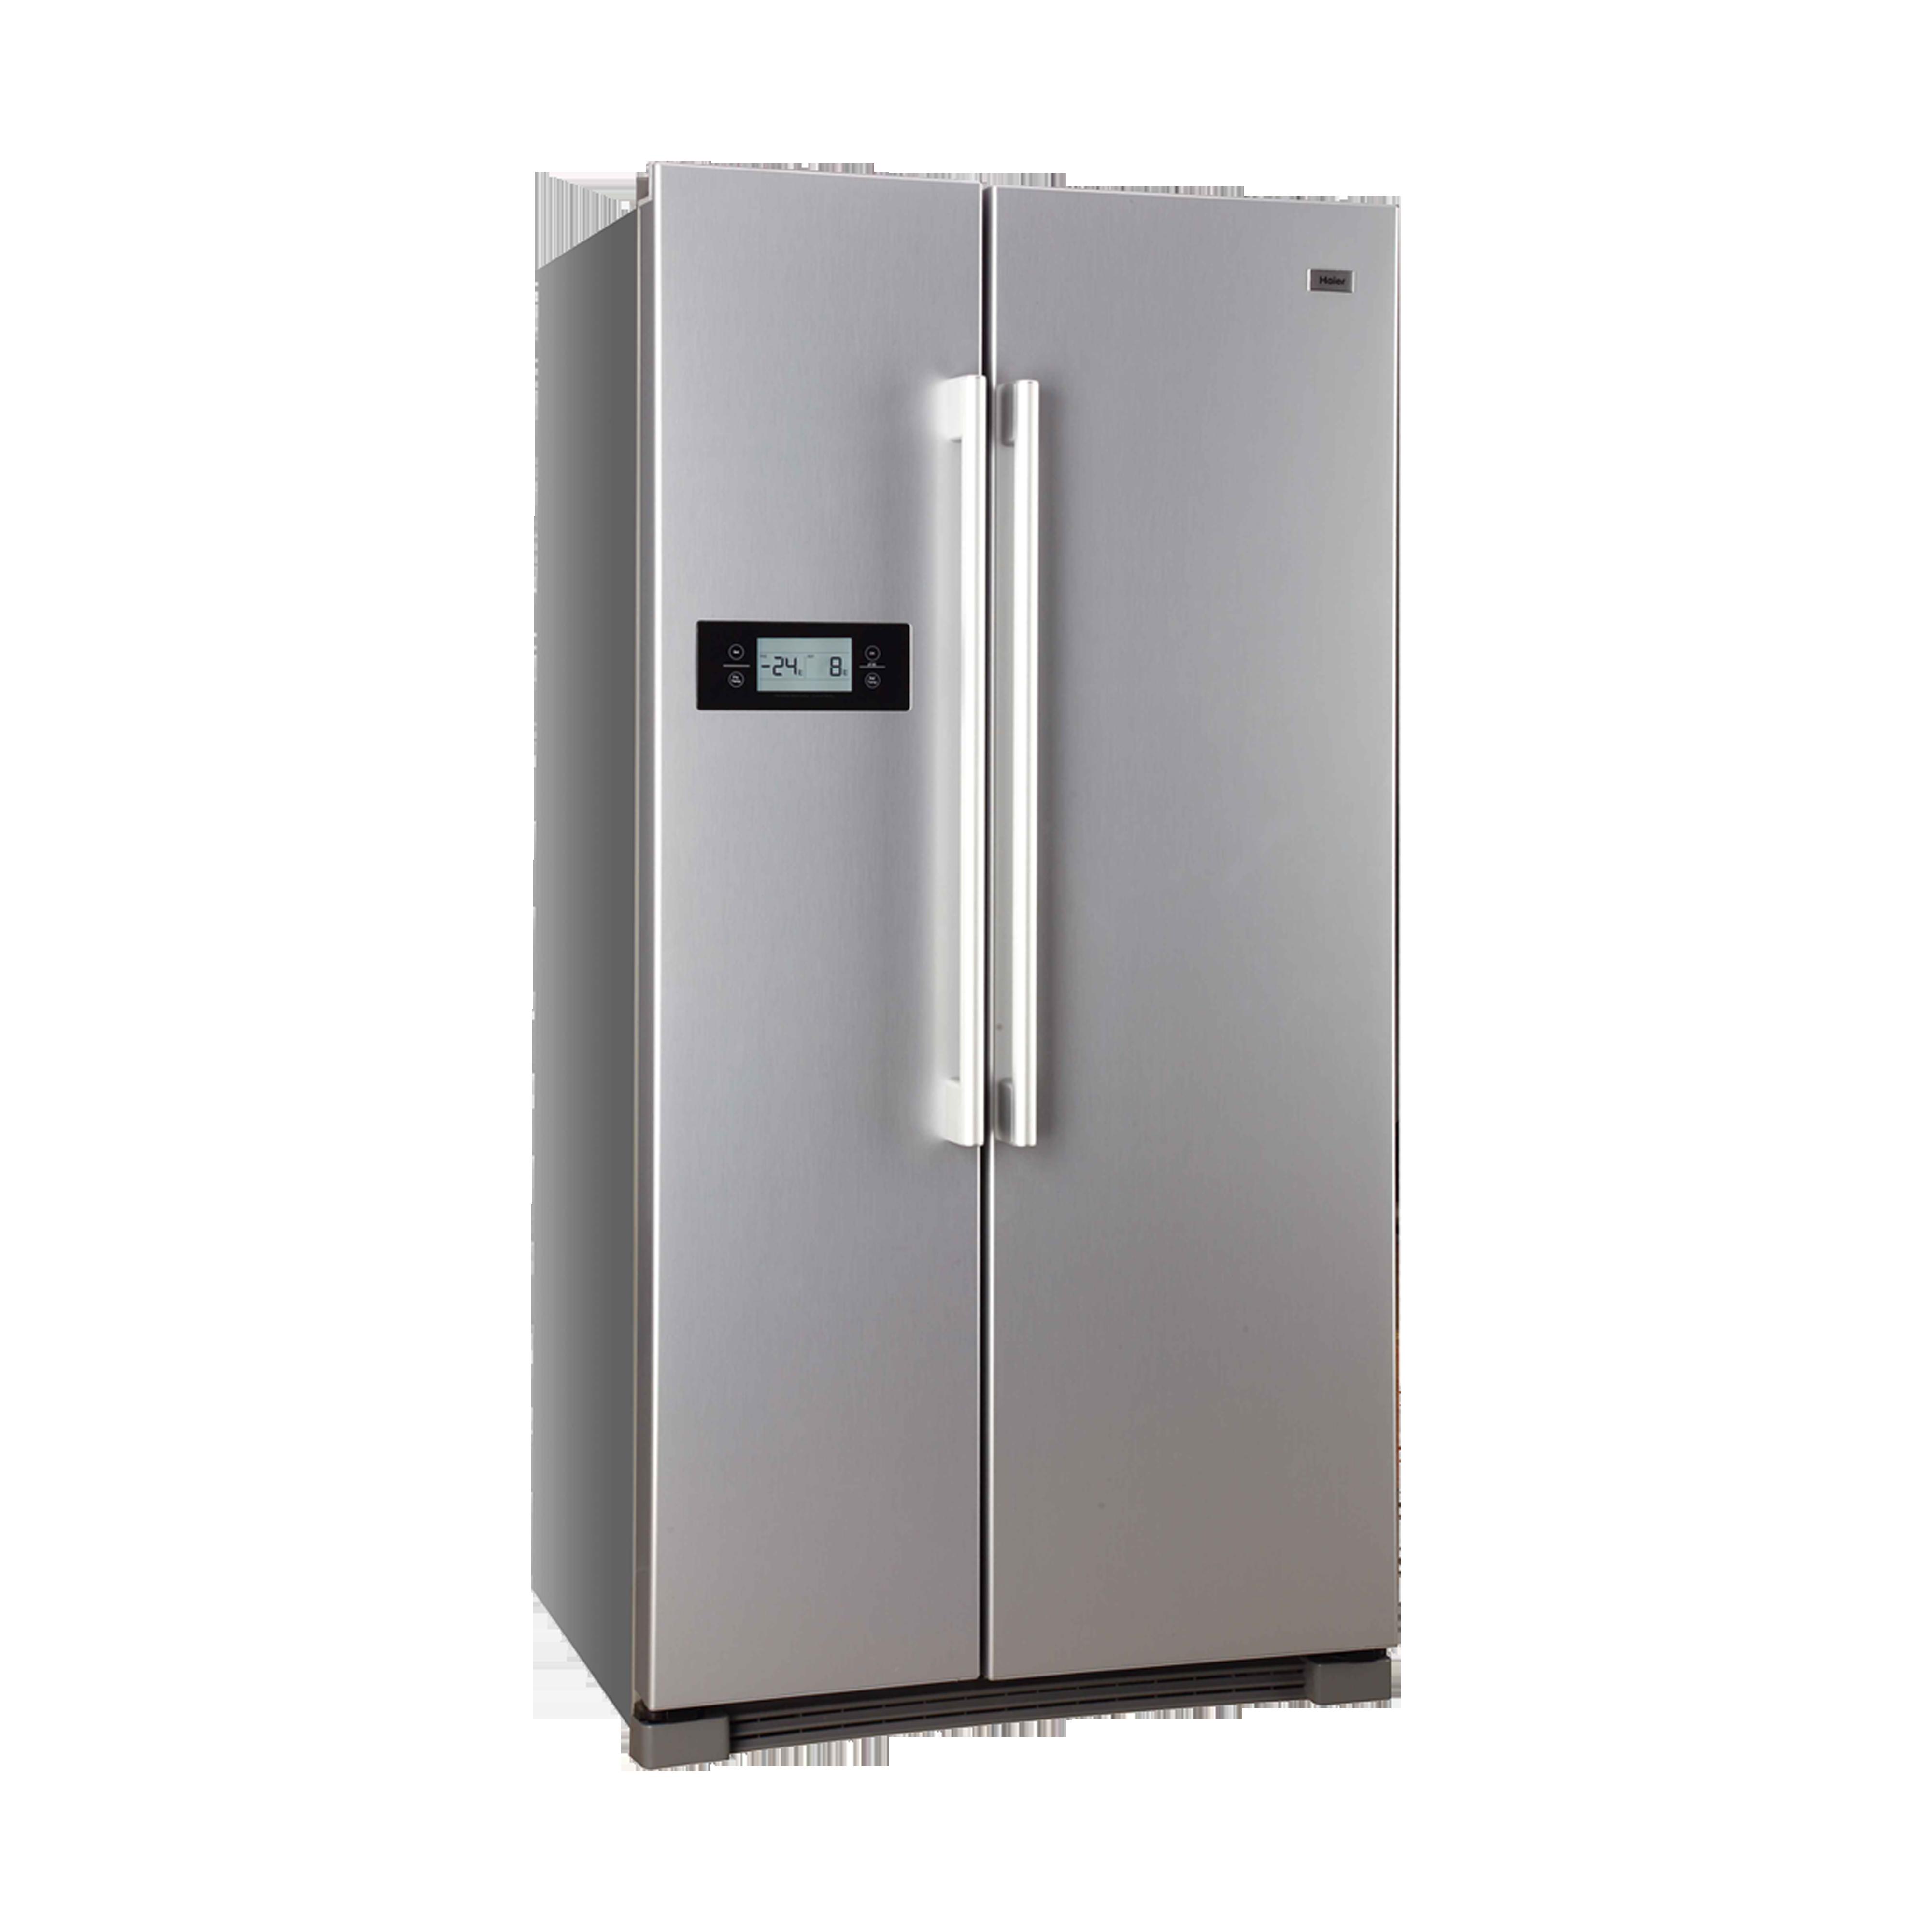 haier american style fridge freezer hrf628df6. Black Bedroom Furniture Sets. Home Design Ideas